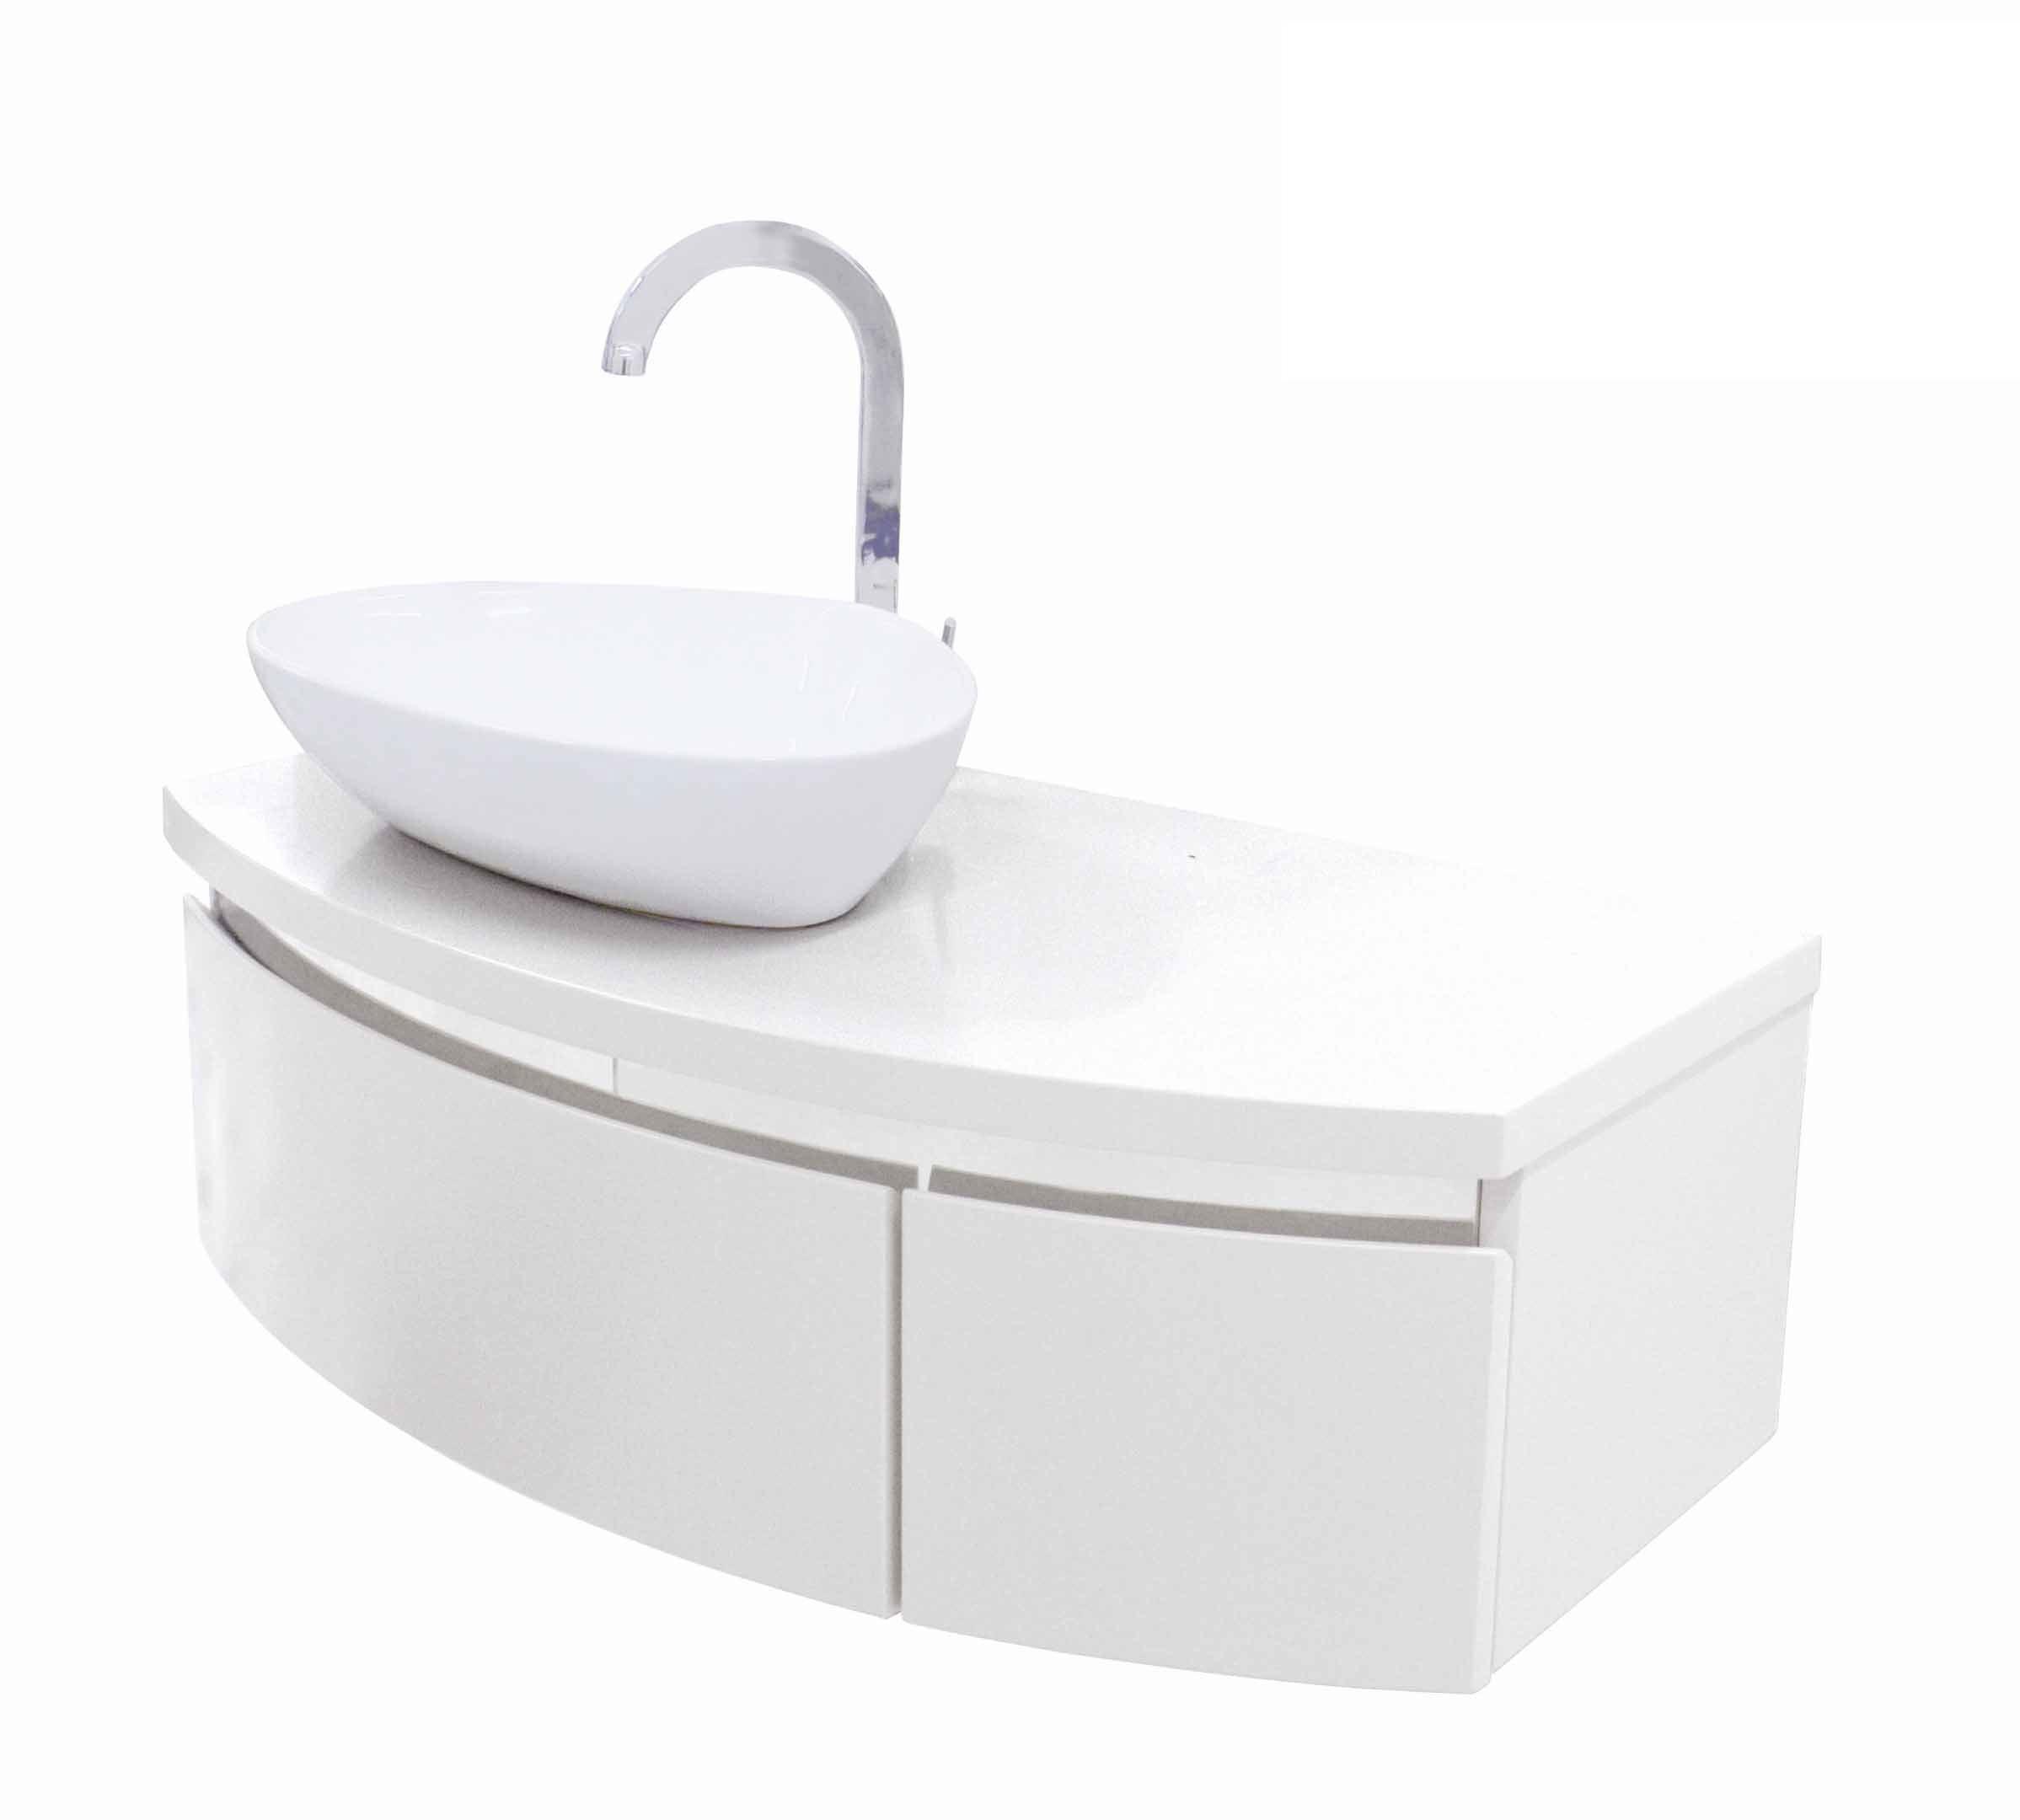 Pratiko storemobile da bagno sospeso brigitte pratiko store for Pianeta casa mobili